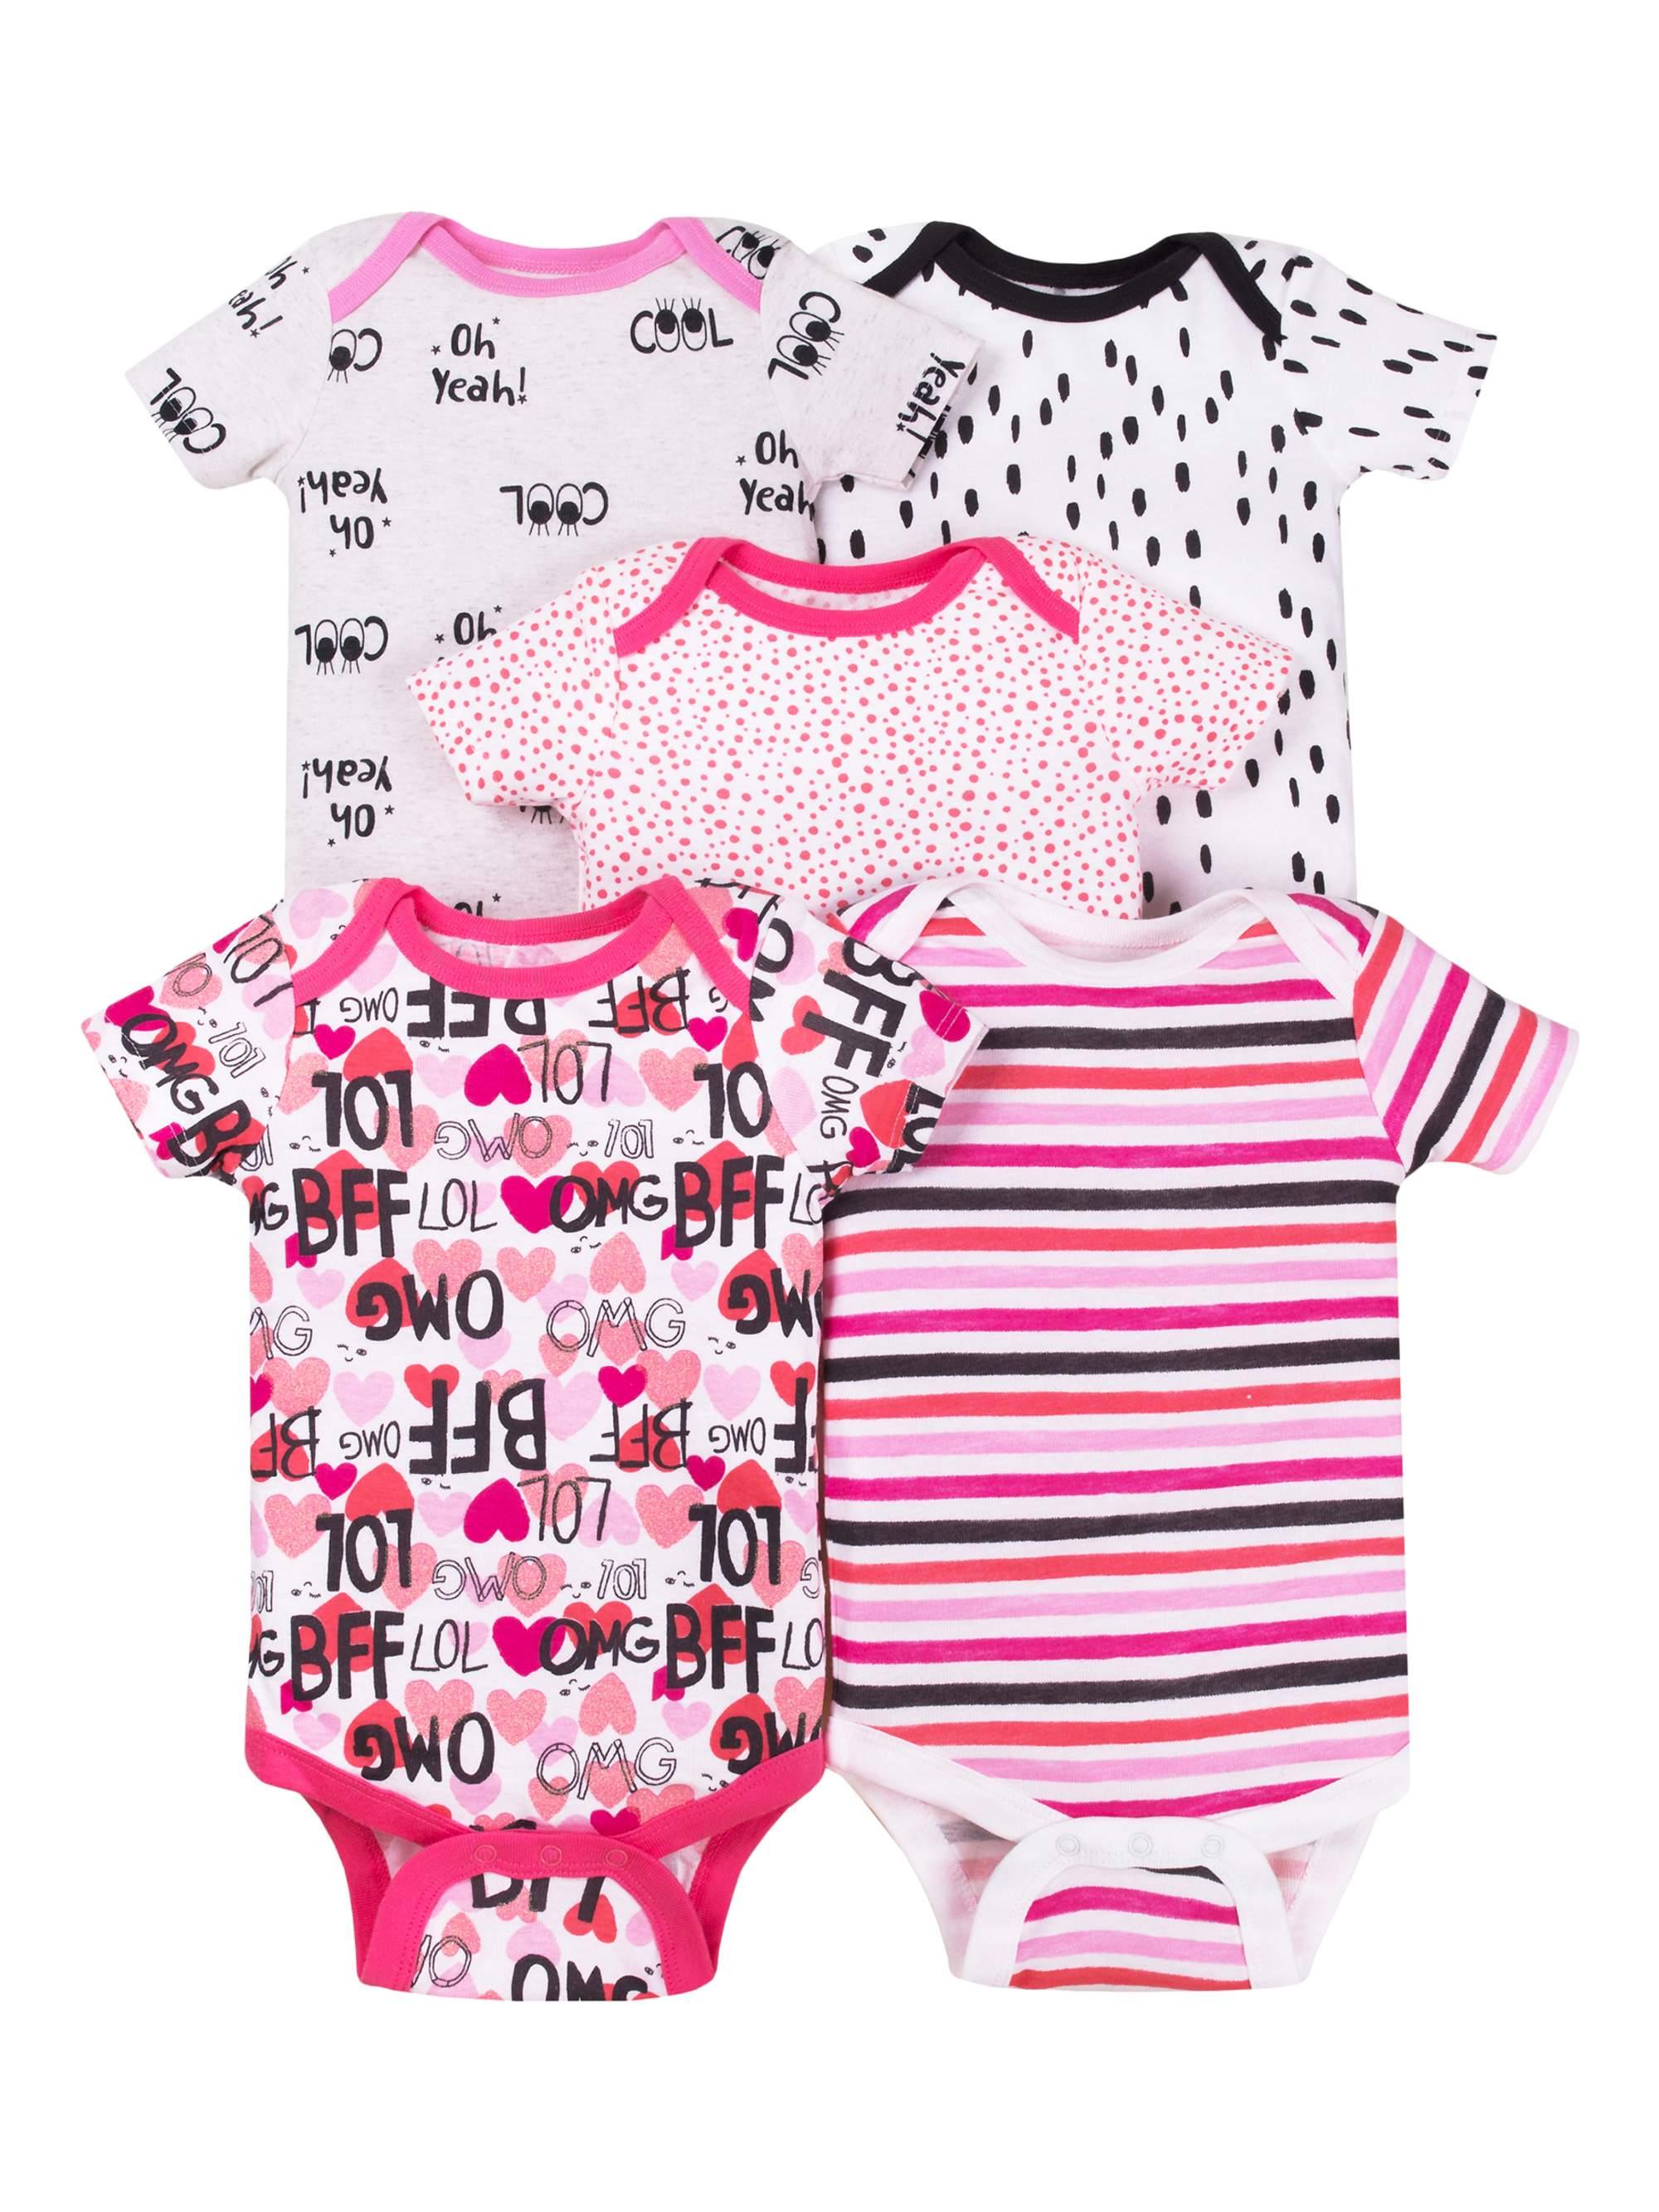 Baby Girl Assorted Short Sleeve Bodysuits, 5-Pack